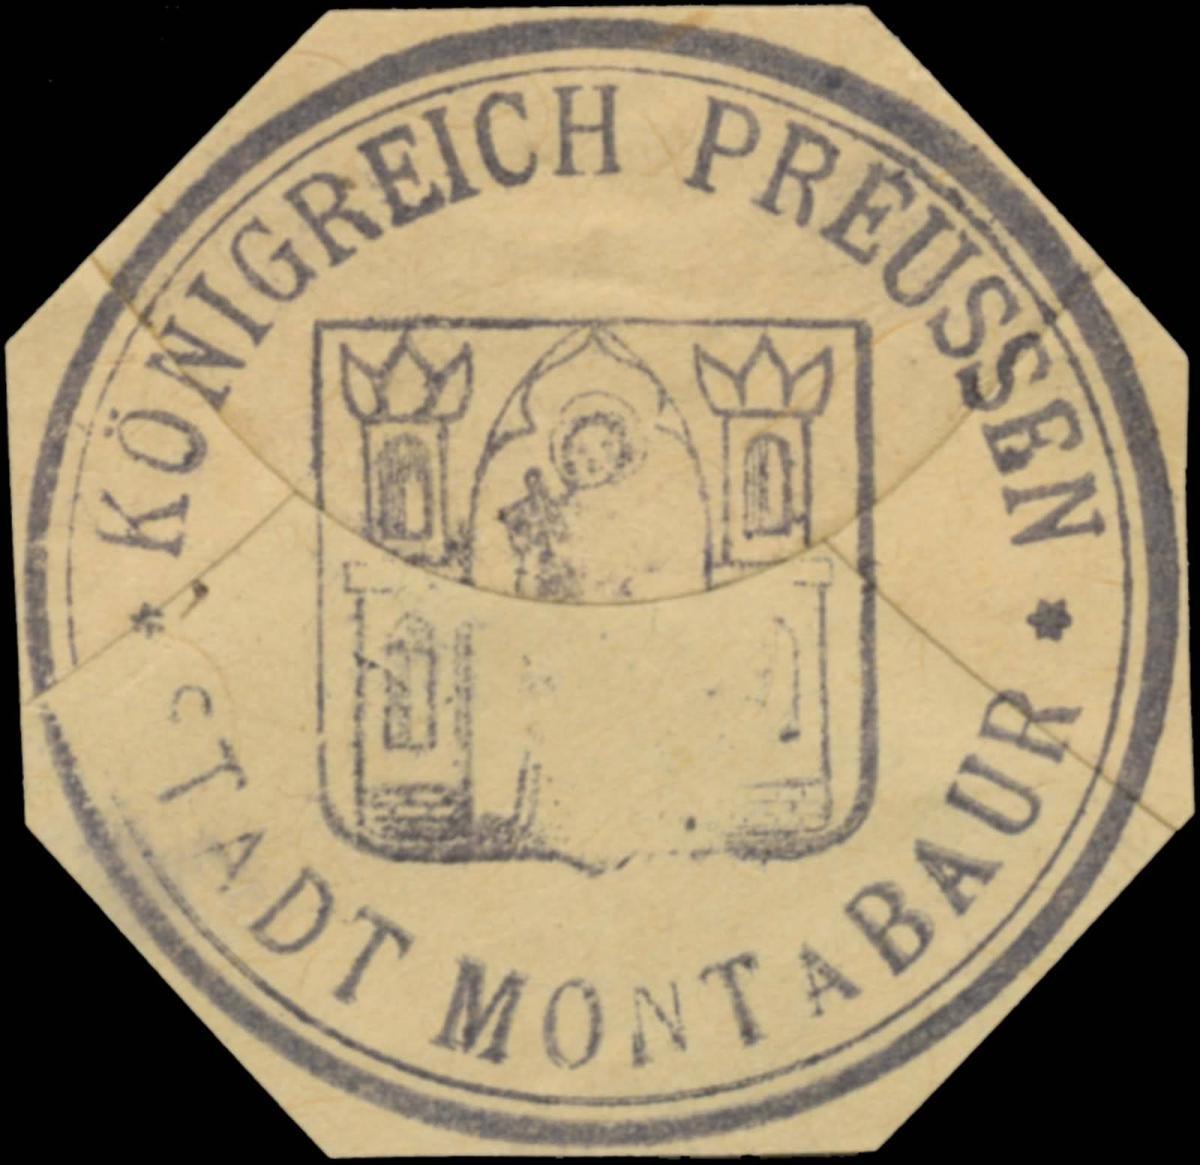 K. Pr. Stadt Montabaur